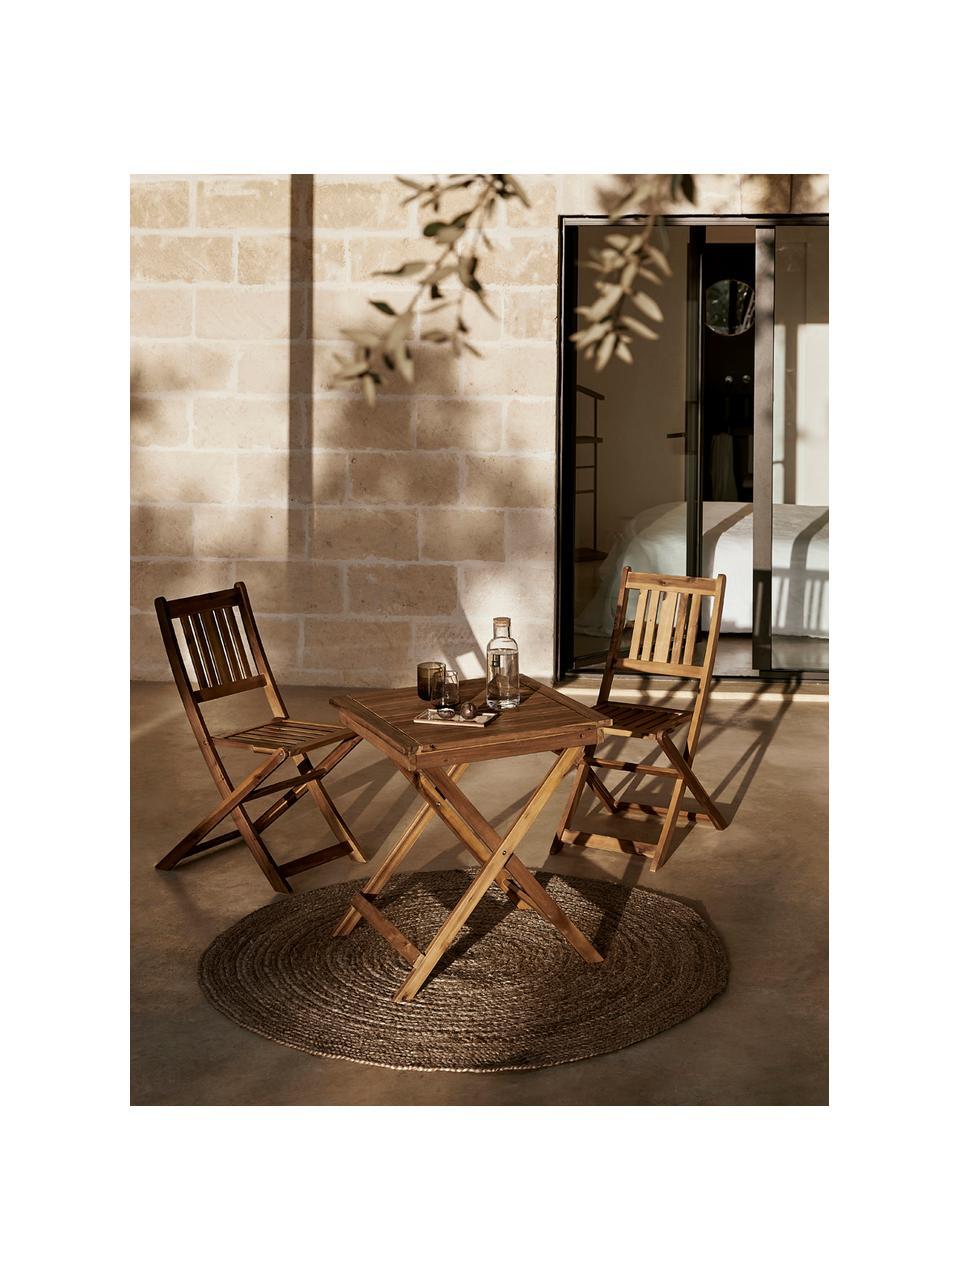 Gartenmöbel Set Skyler aus Akazienholz, 3-tlg., Braun, Sondergrößen